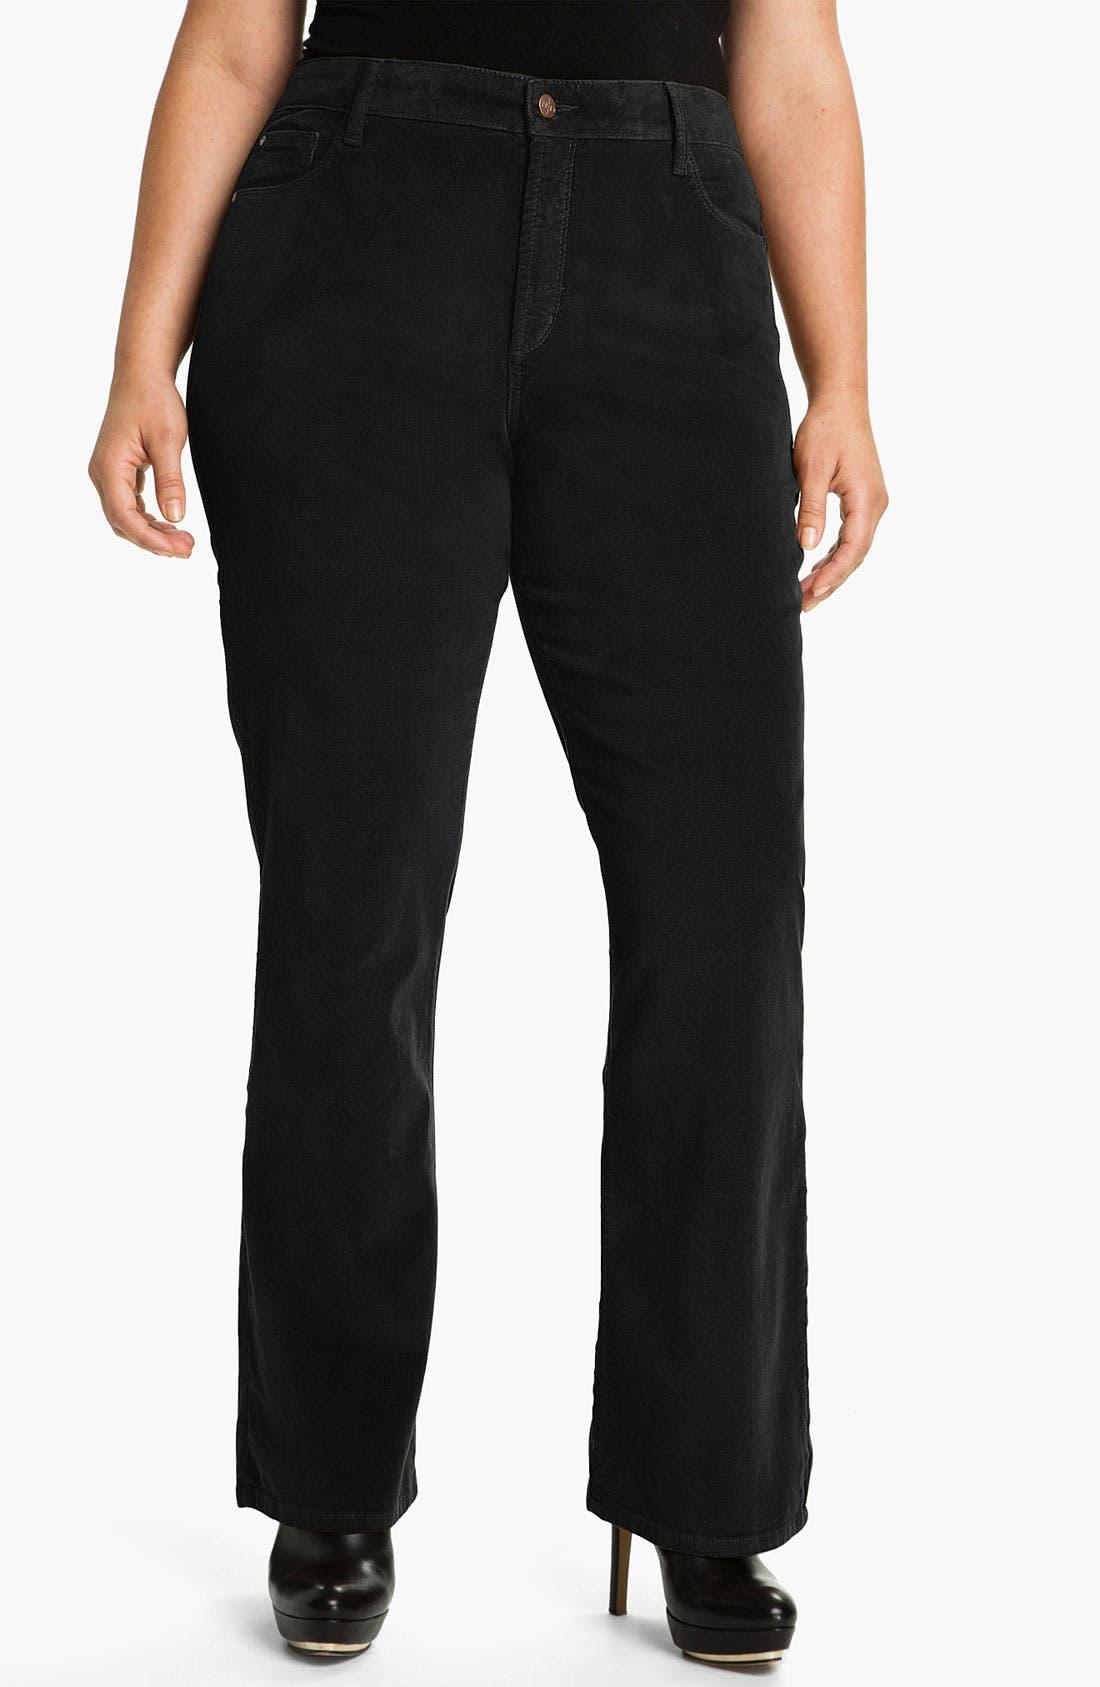 Alternate Image 1 Selected - NYDJ 'Barbara' Bootcut Corduroy Pants (Plus)